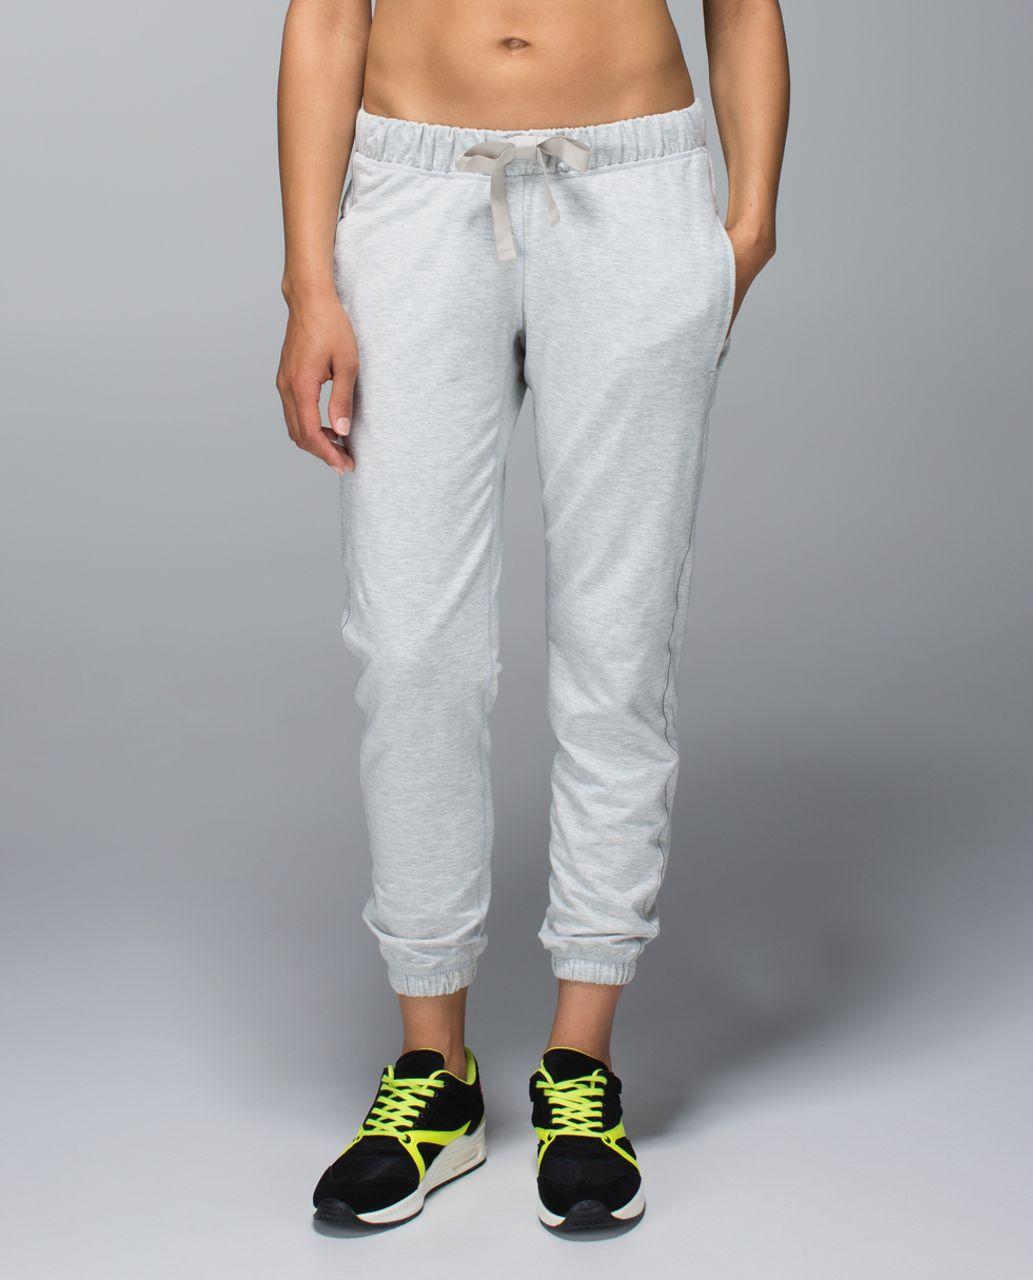 841e078065 Lululemon Serenity Pant - Heathered Light Grey - lulu fanatics